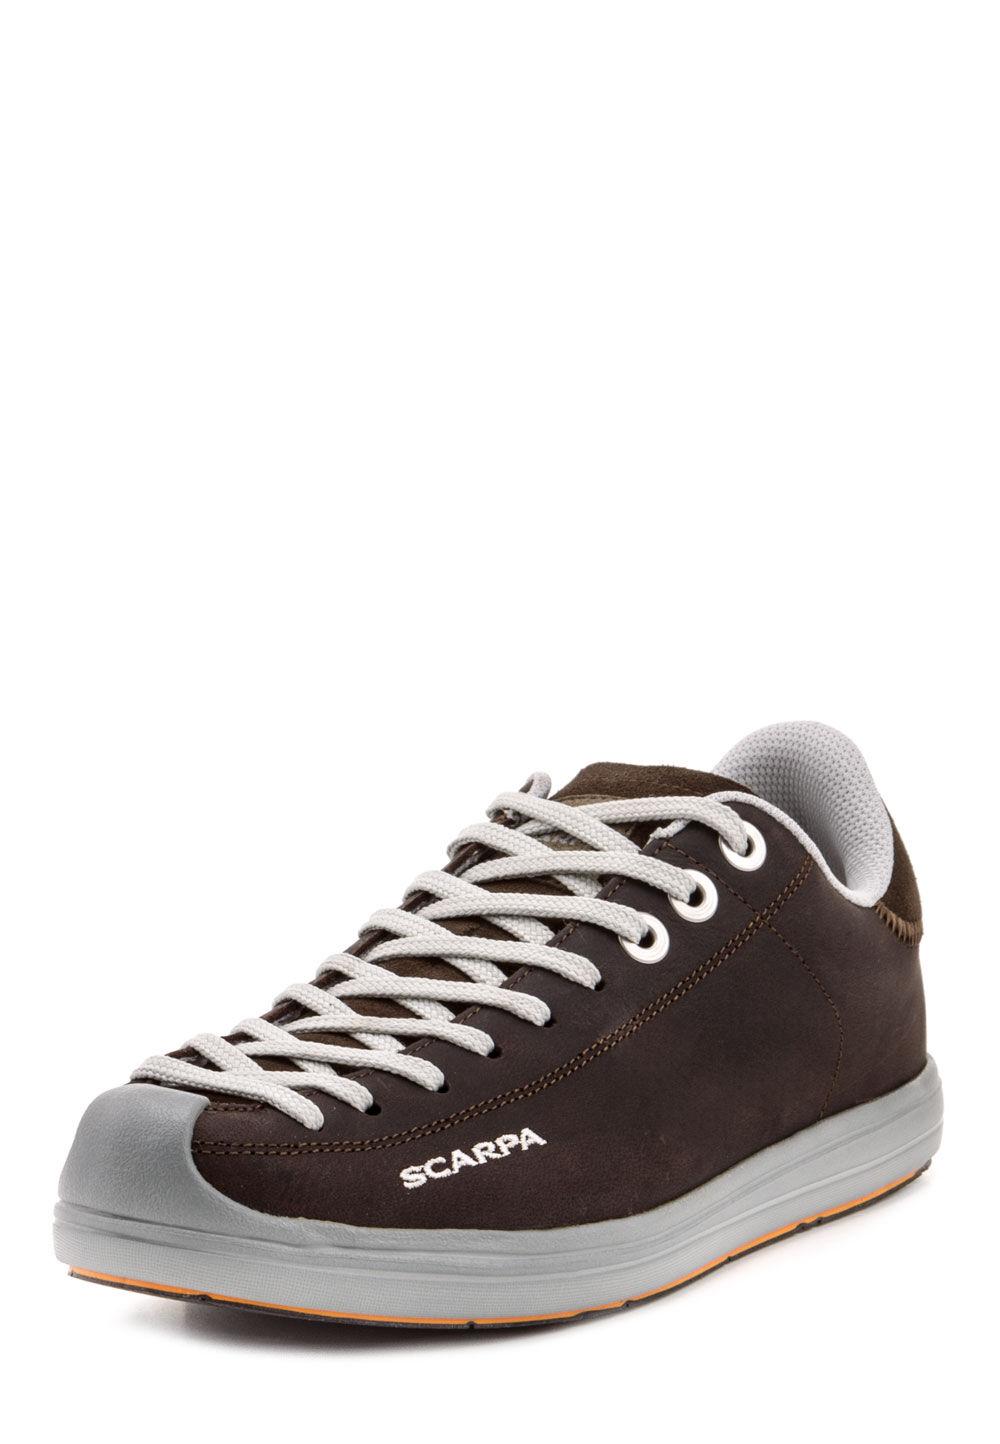 Scarpa Sneaker Visual, Leder, dunkelbraun